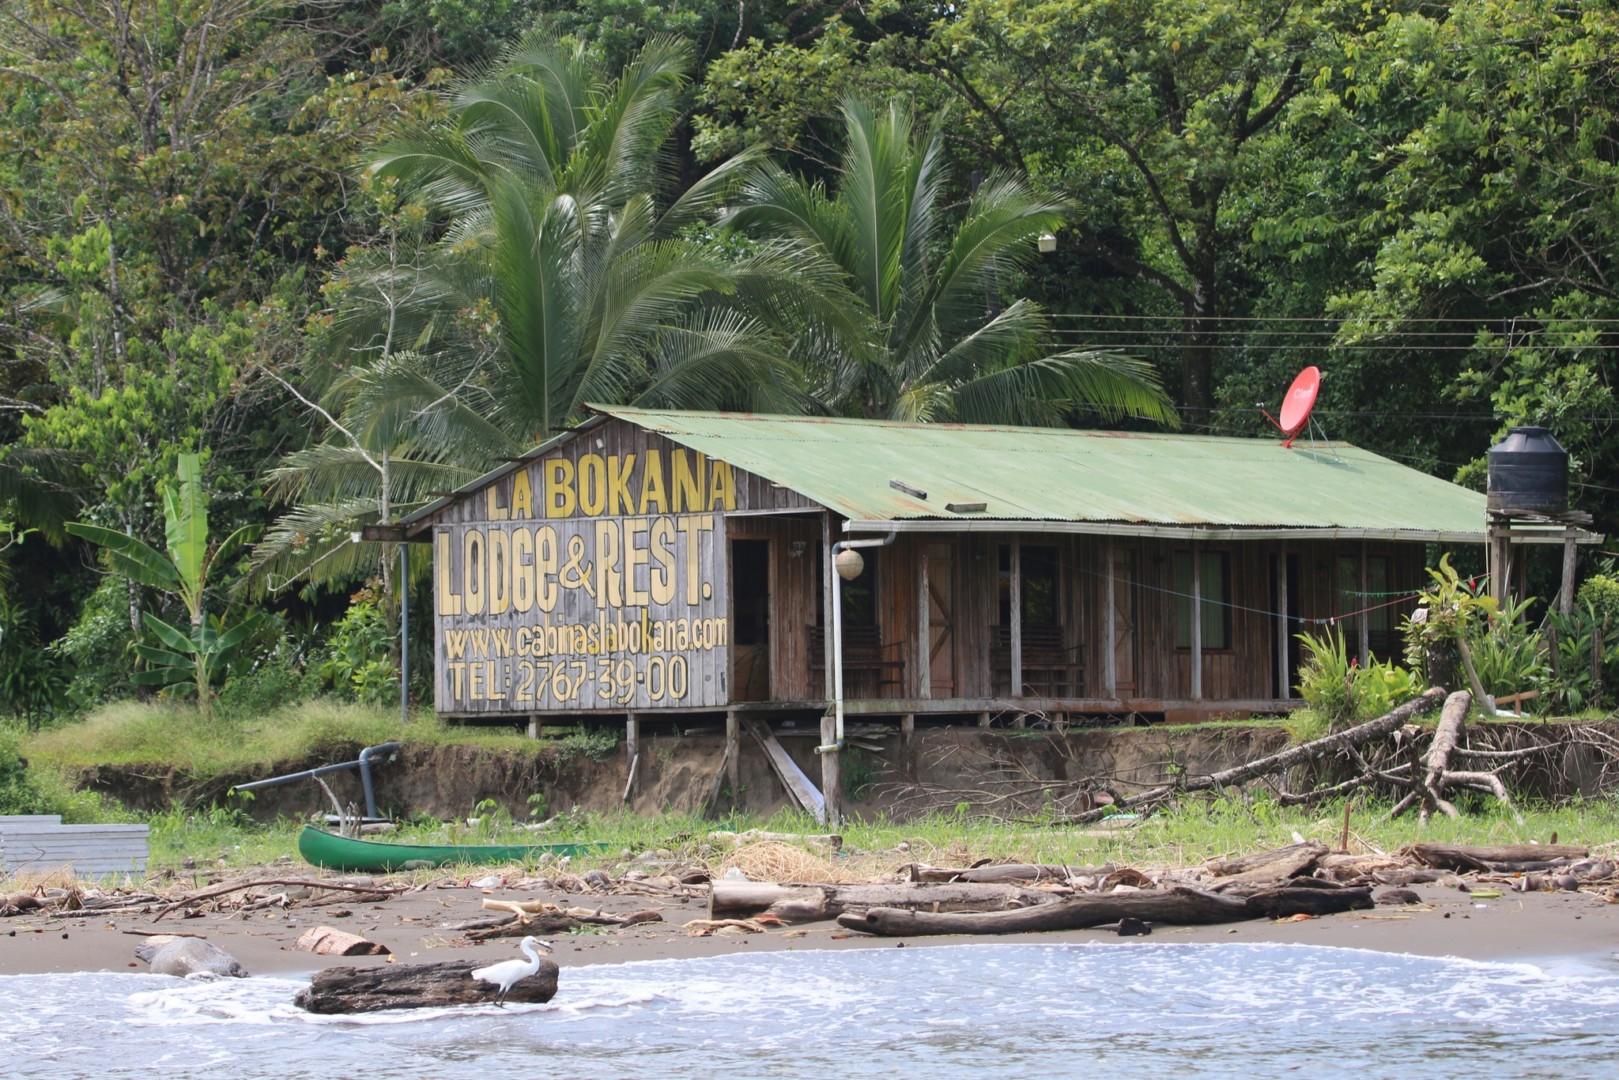 Blog Costa Rica Jozef 2015